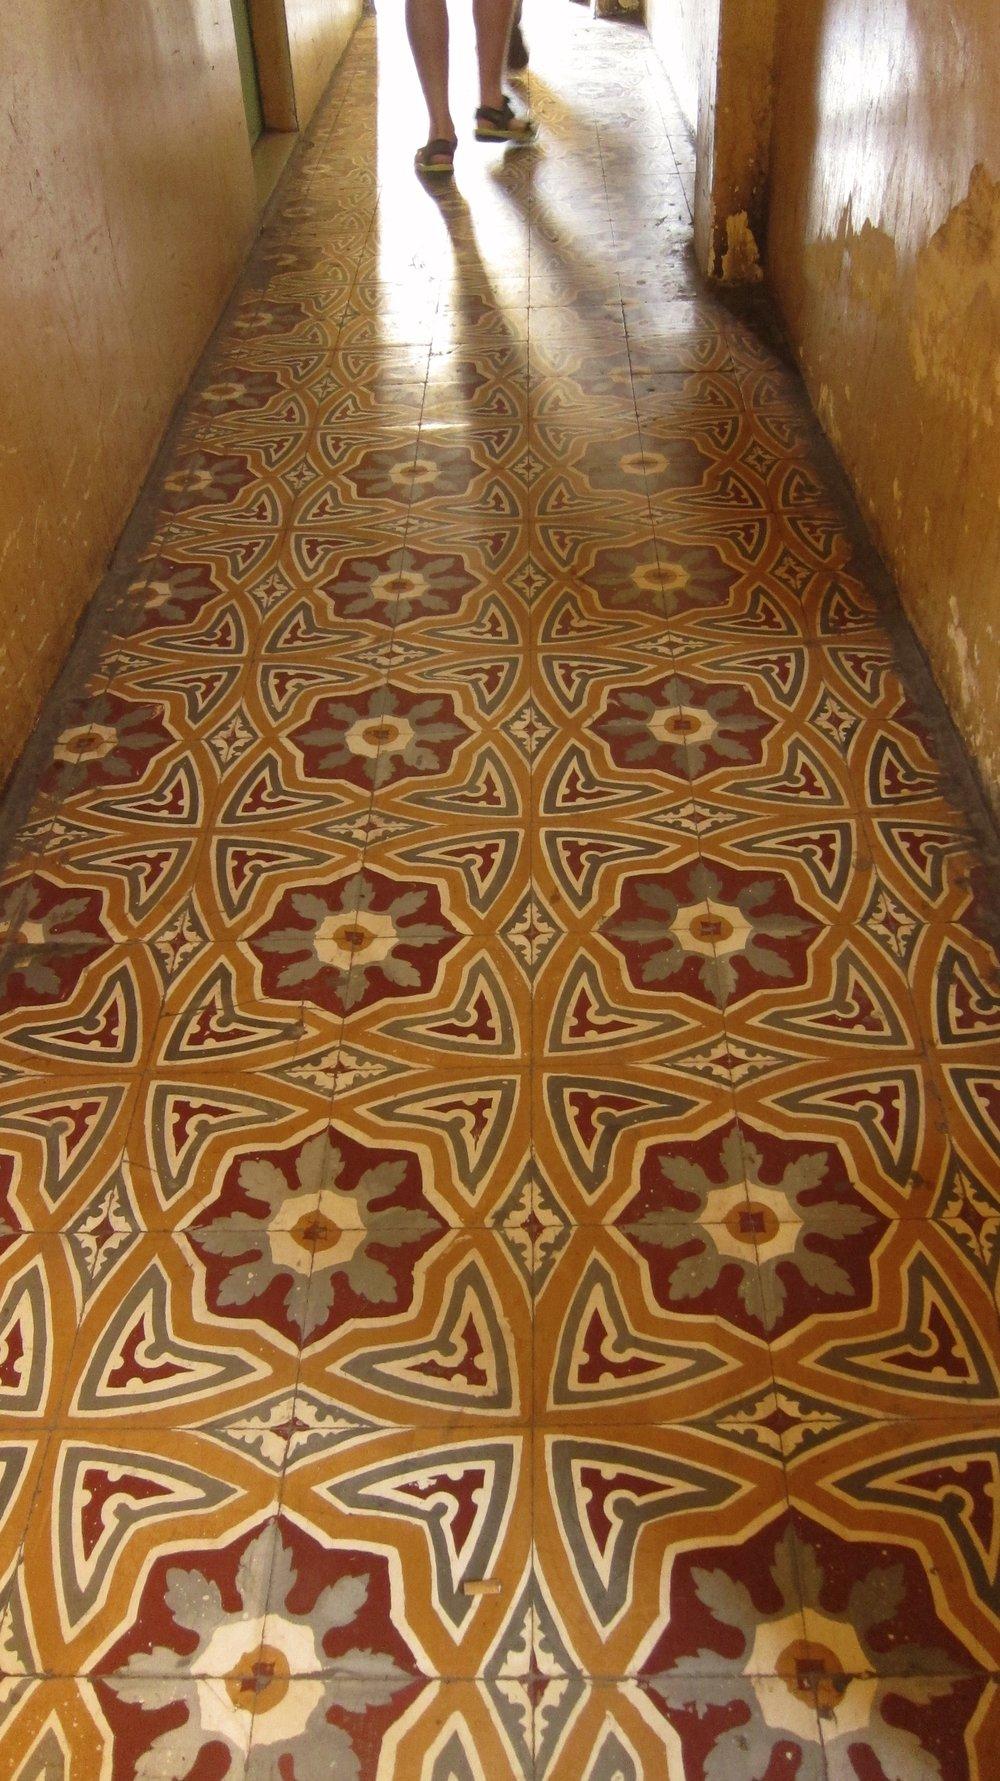 Original tile floor lining the hallways of the Hotel Manolis.